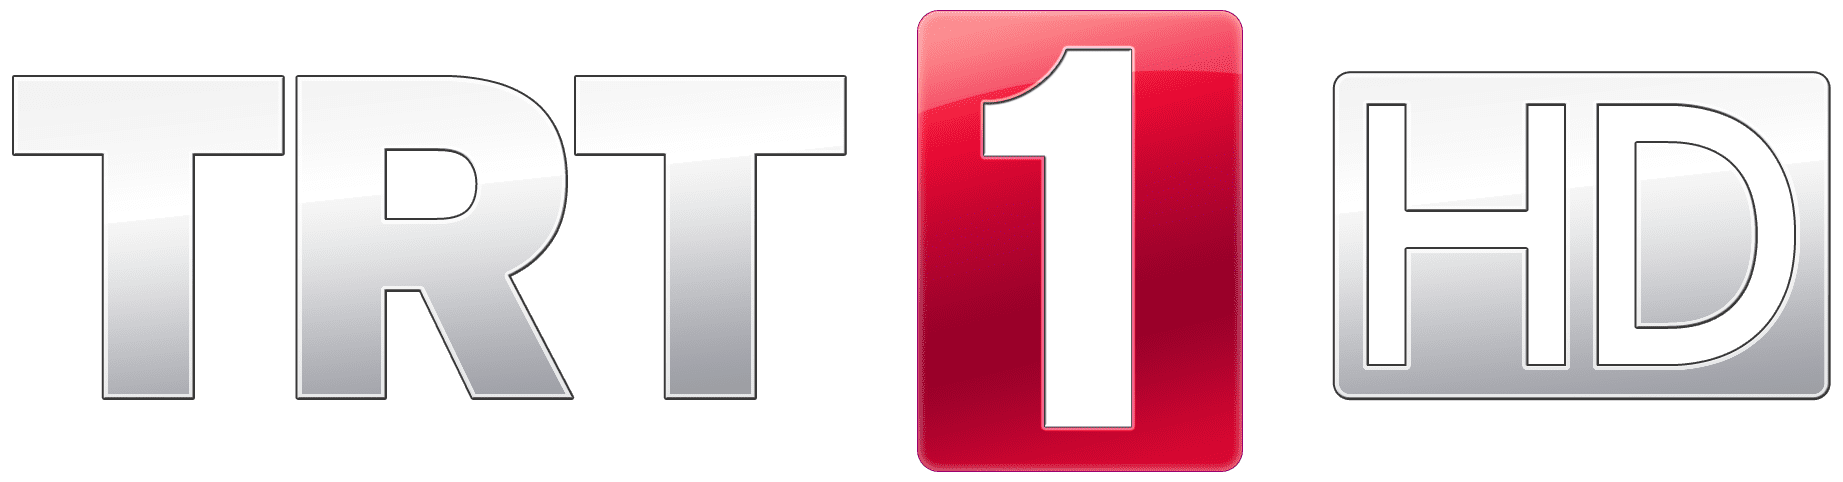 TRT1 HD Logo [PNG] png